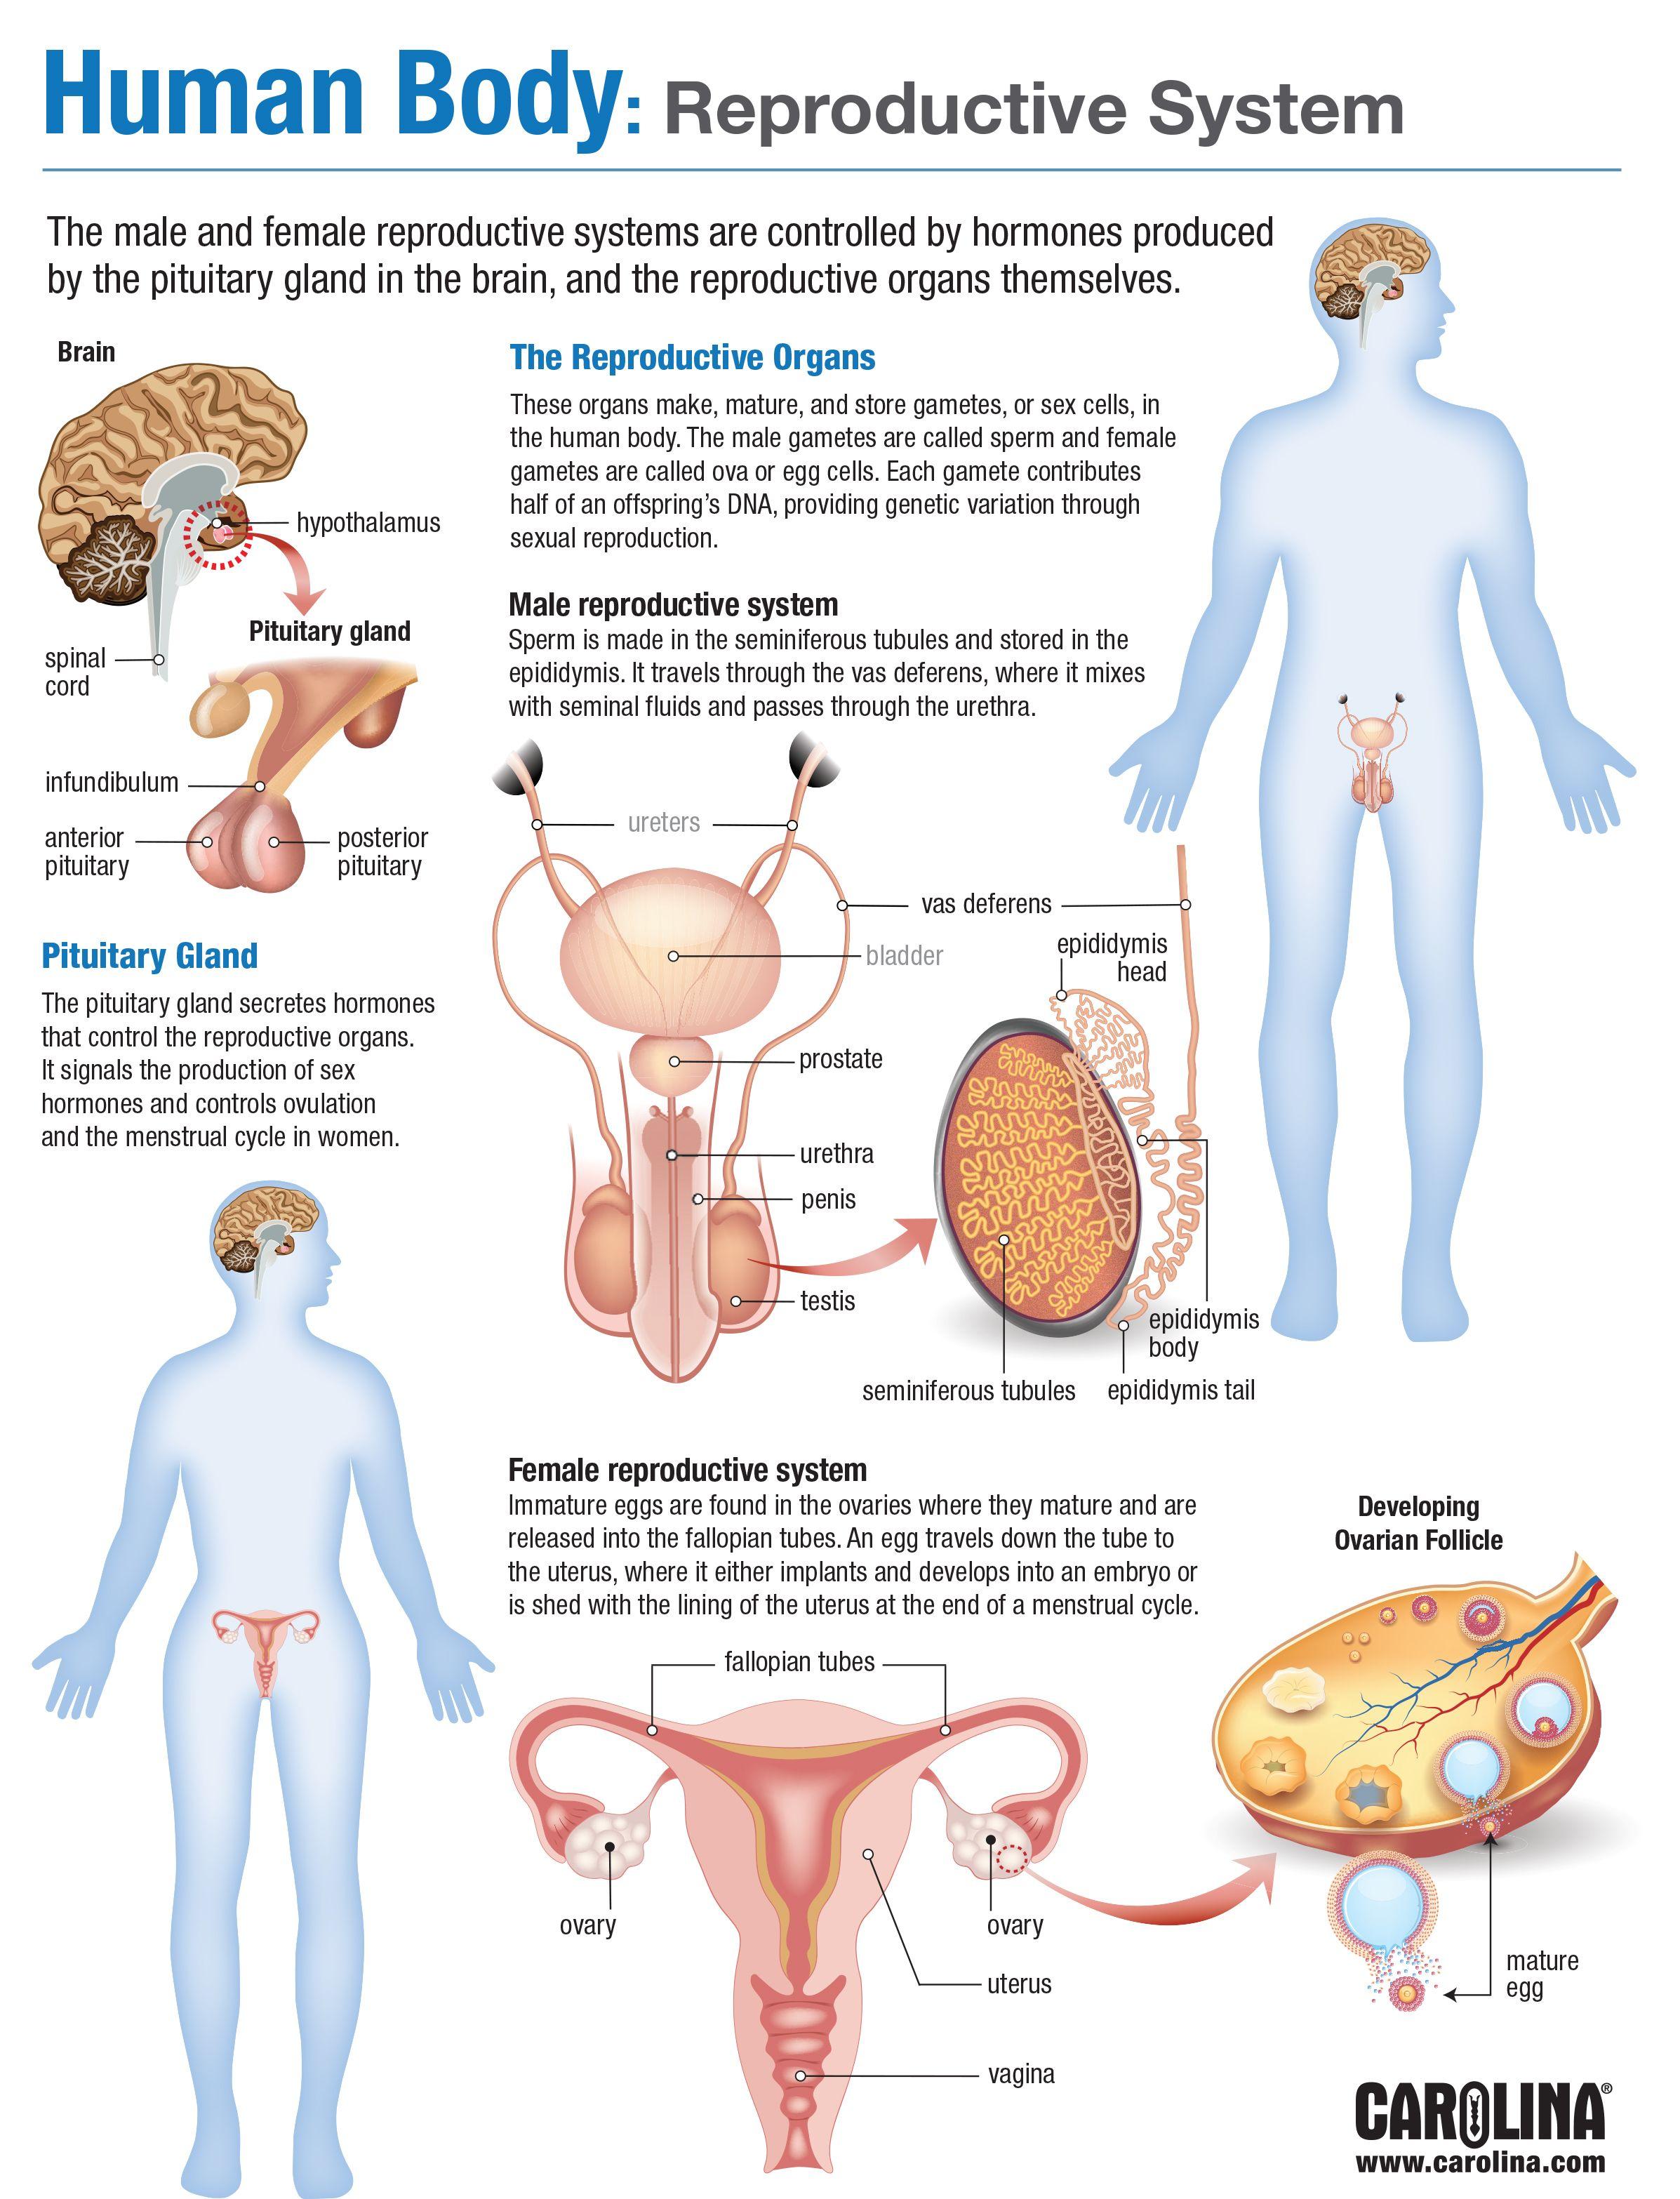 human body: reproductive system | carolina, Muscles